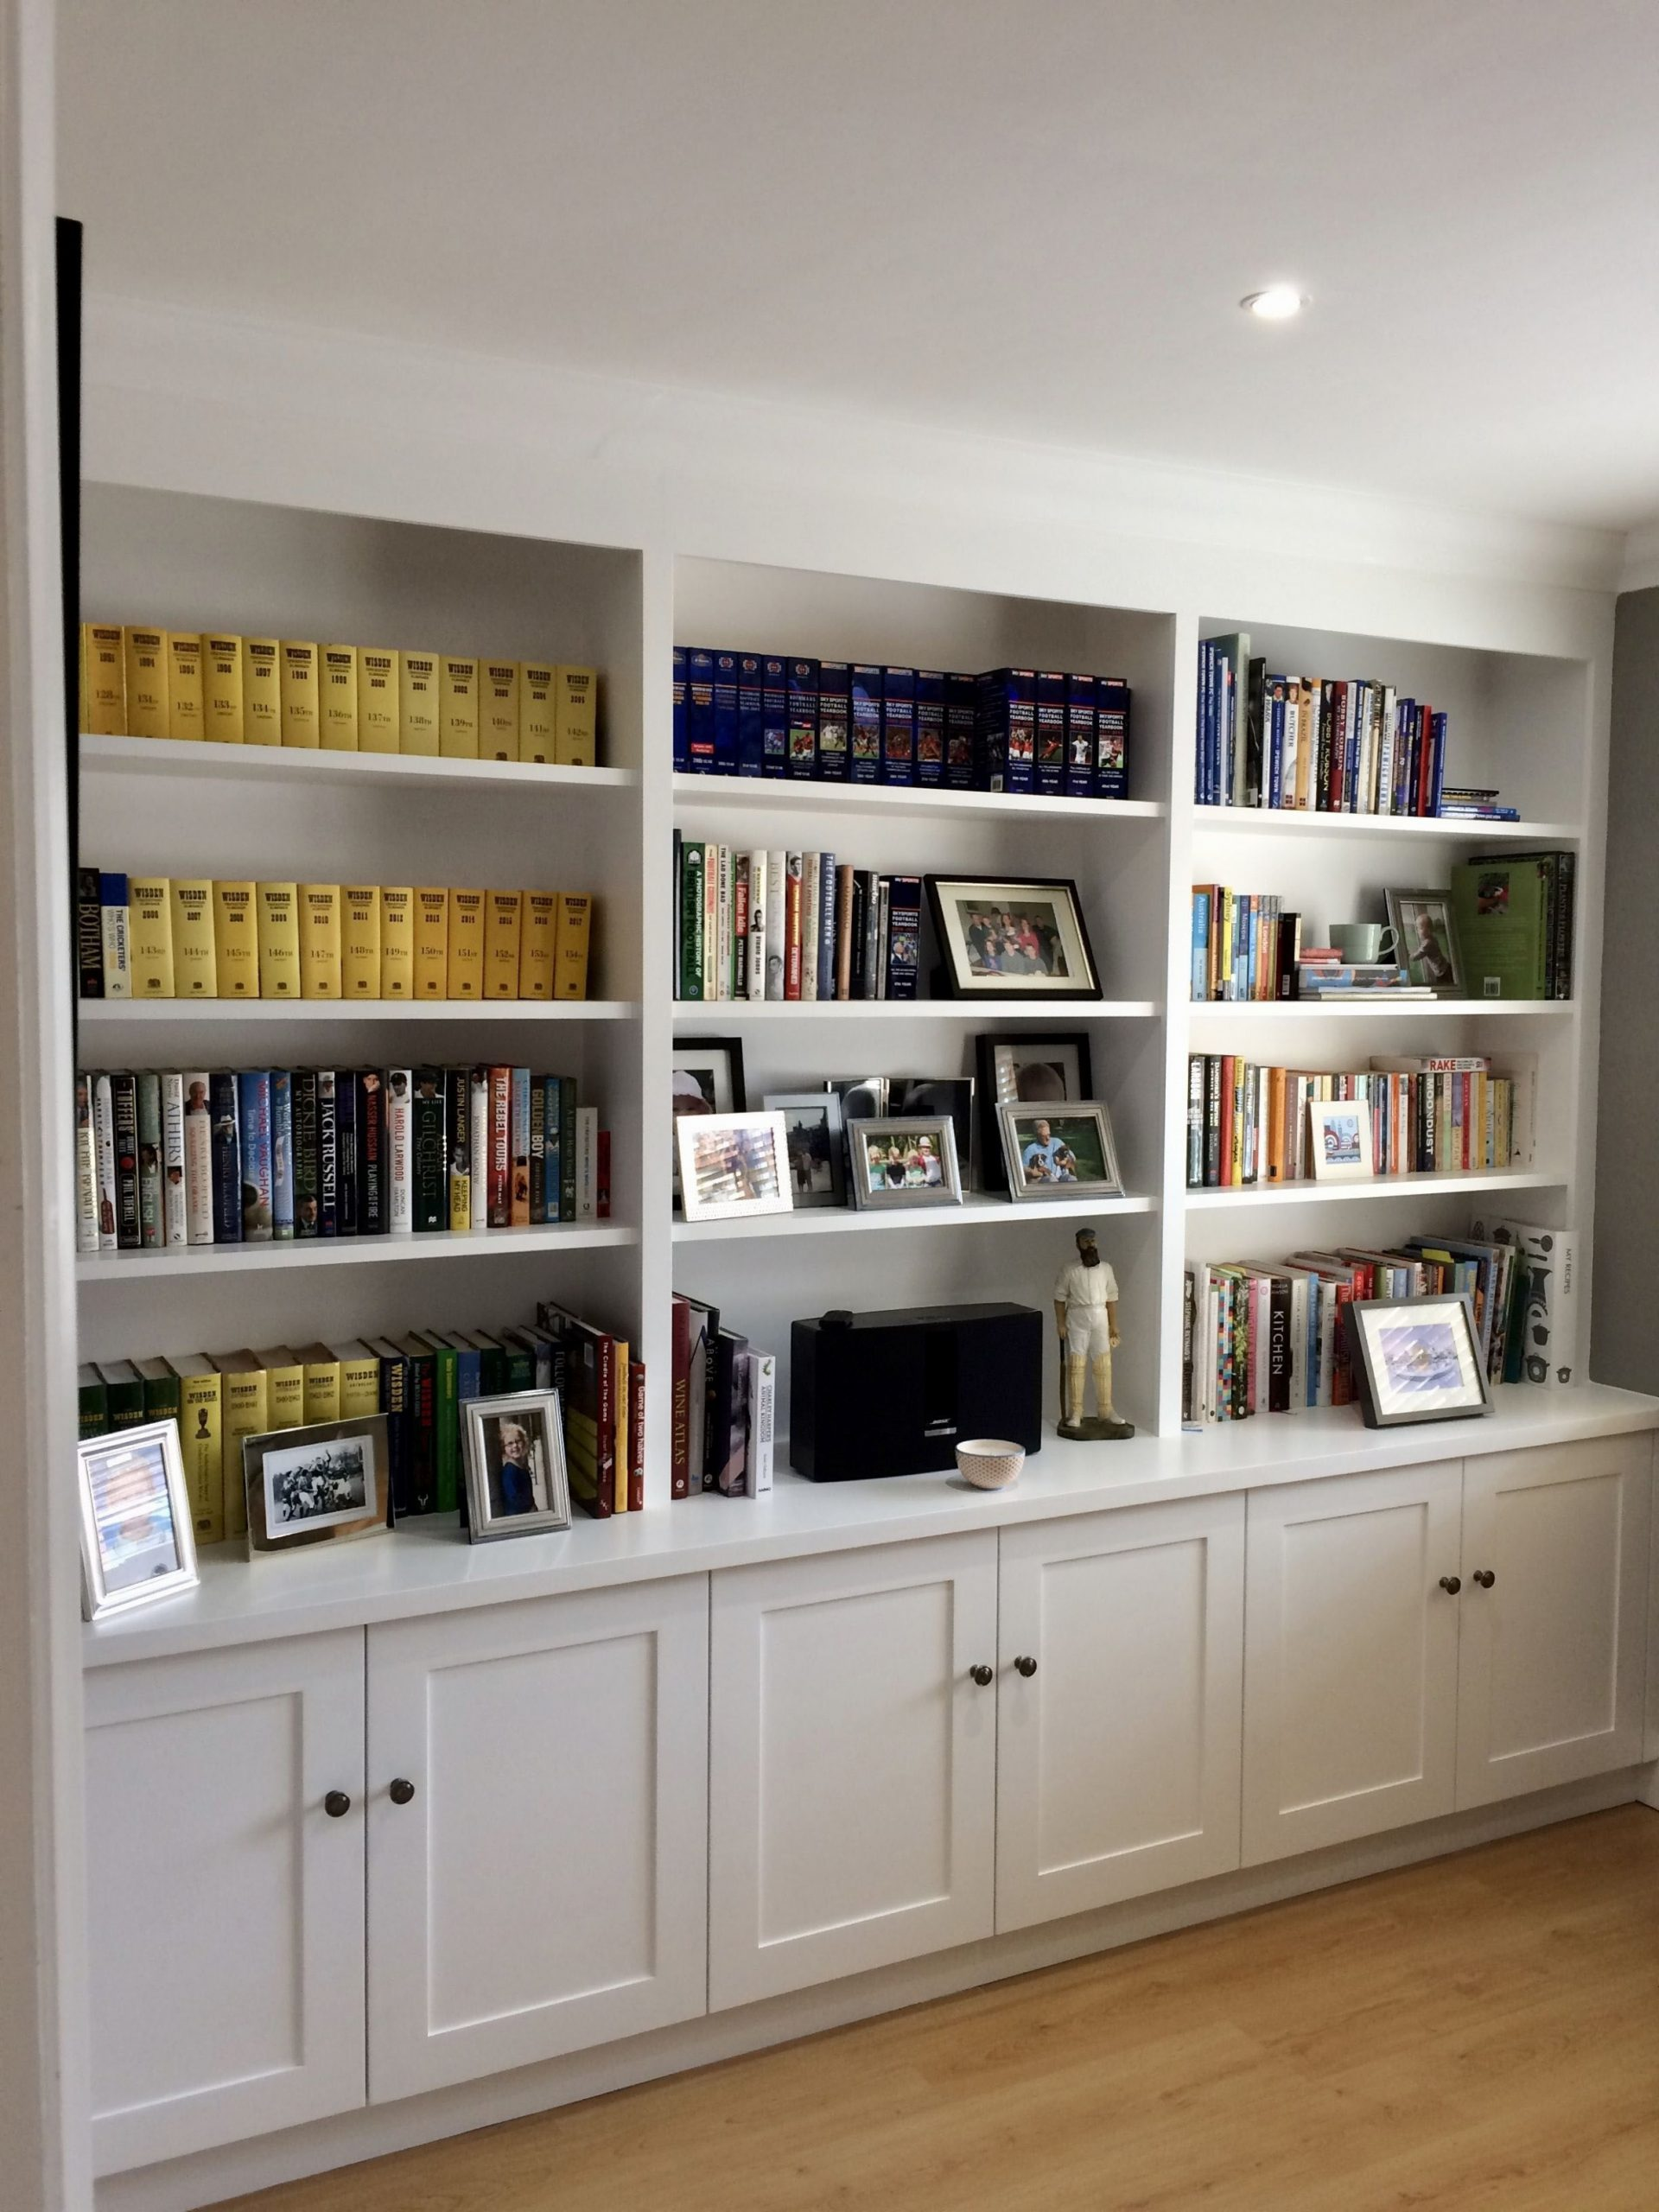 Inspiring home office ideas uk just on interioropedia